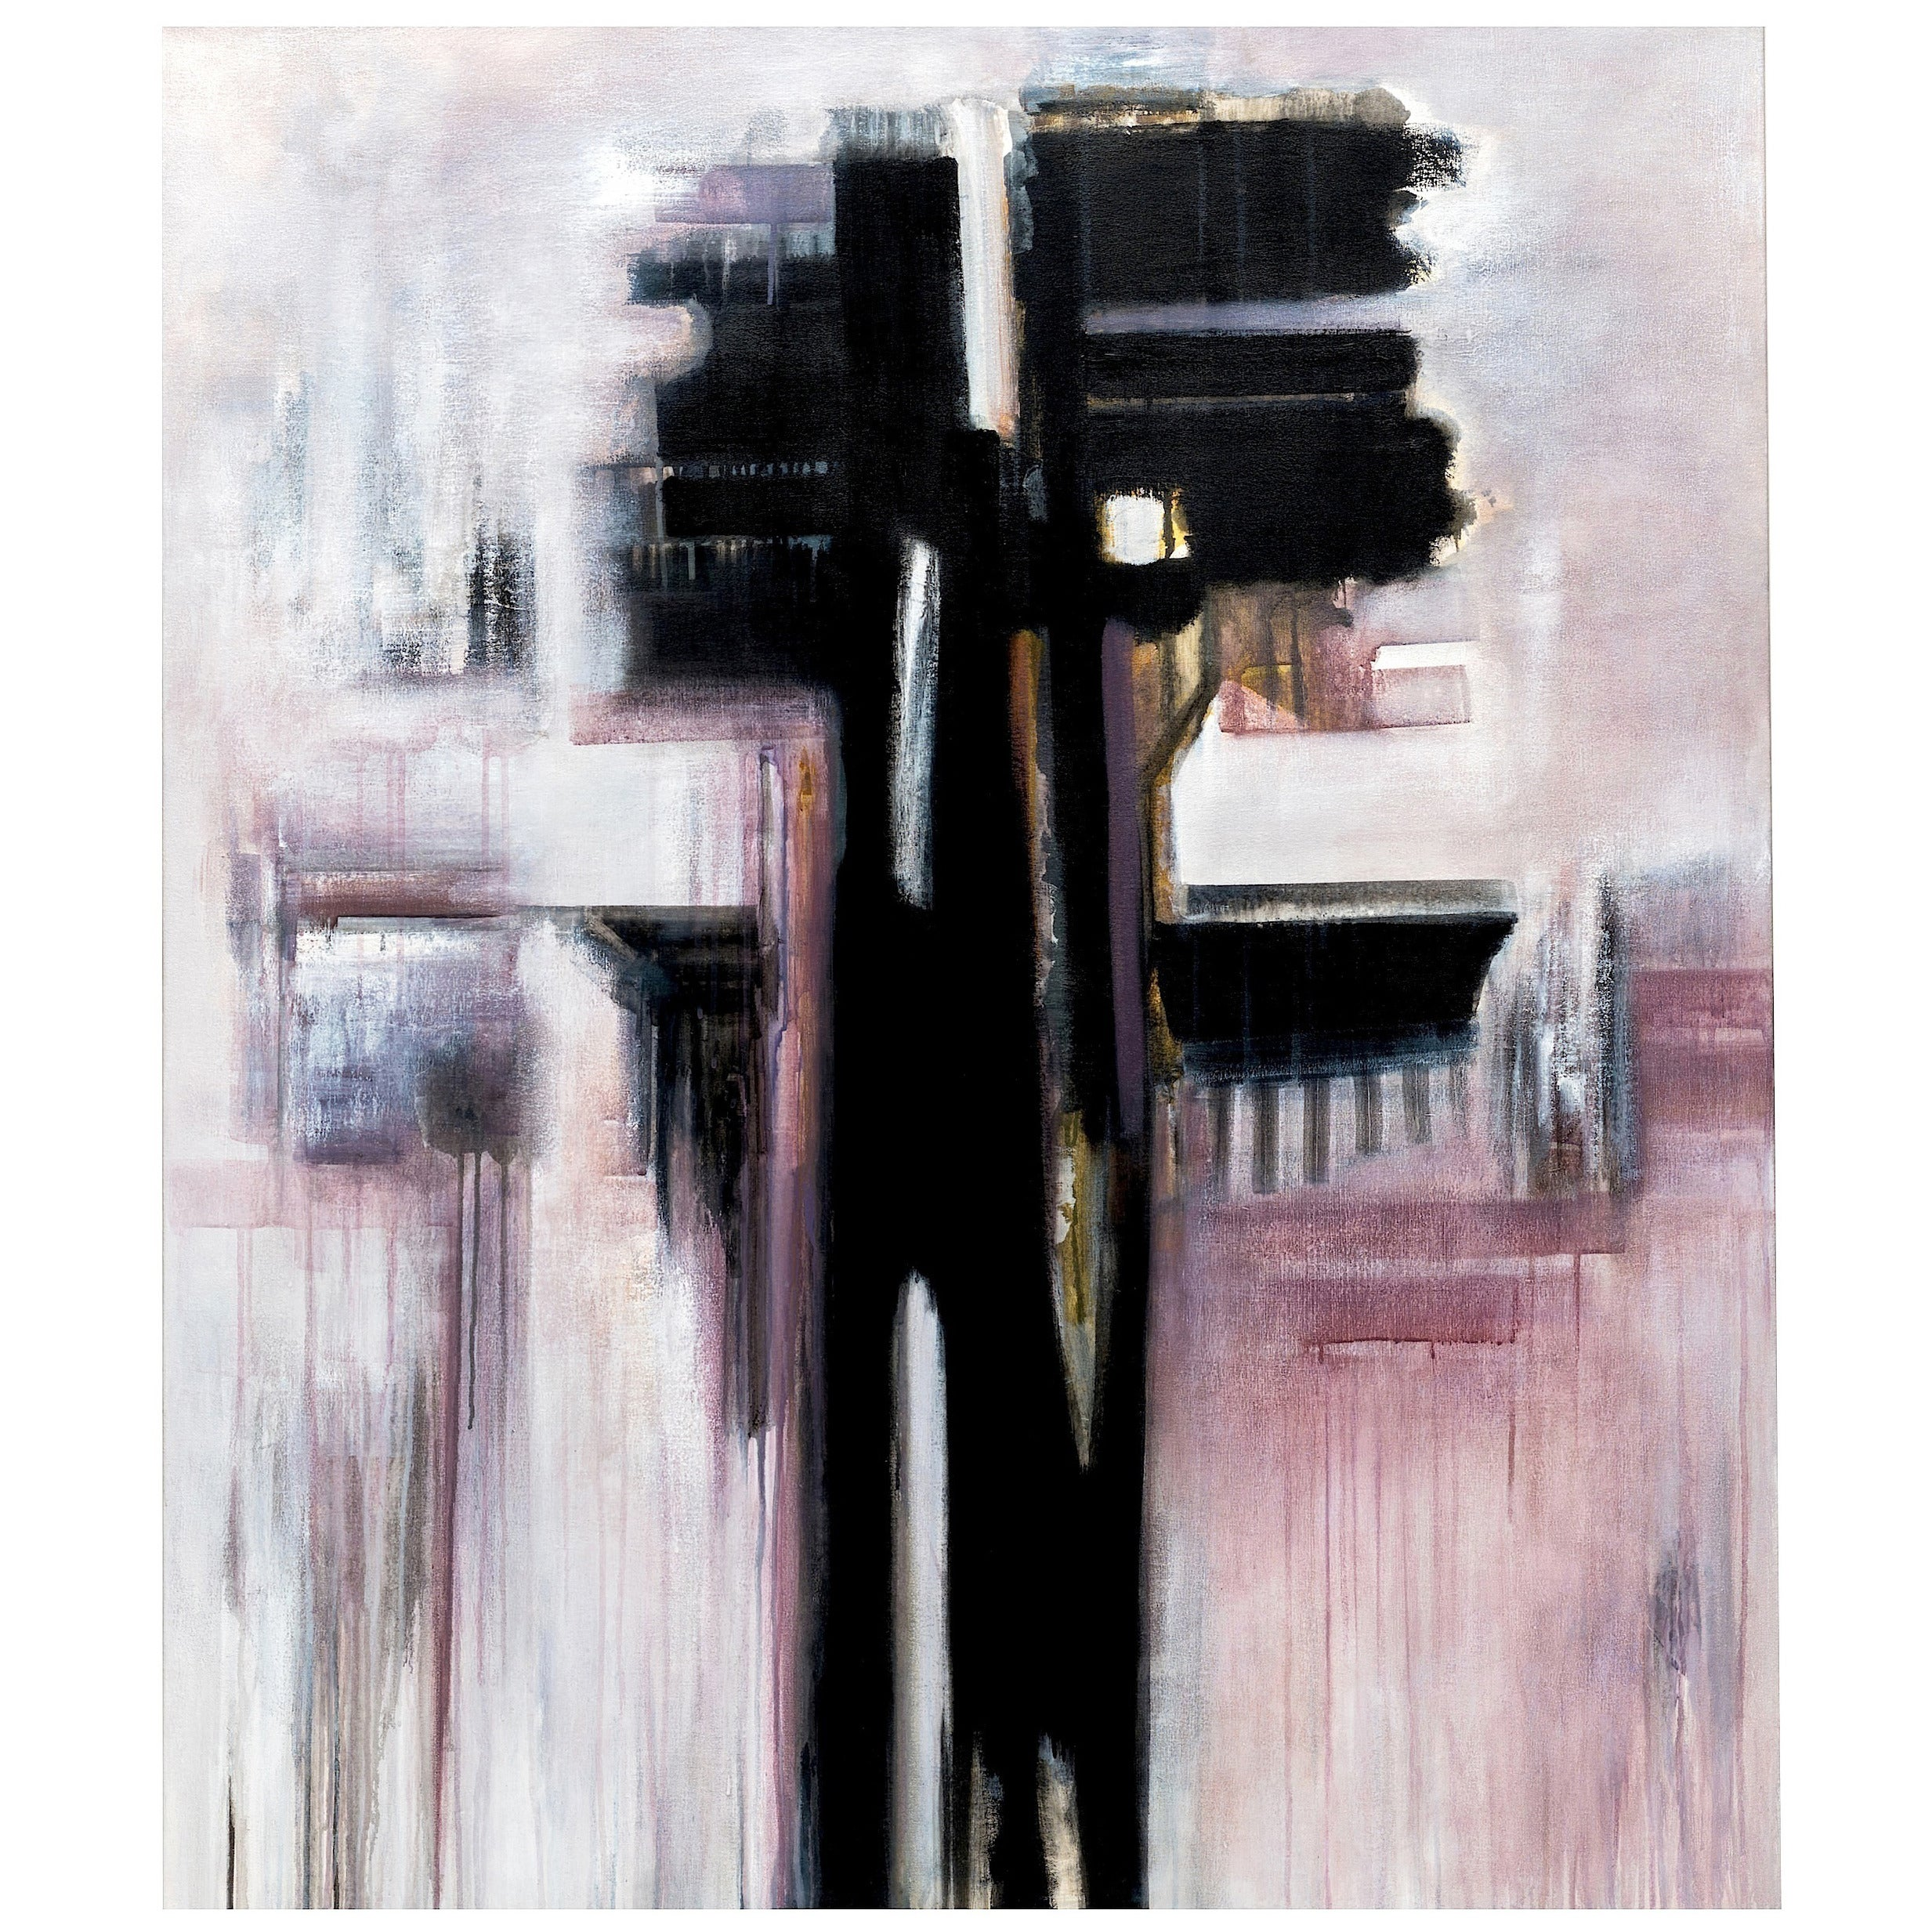 Modern Black & White Abstract Painting by Brazilian Artist Ivanilde Brunow